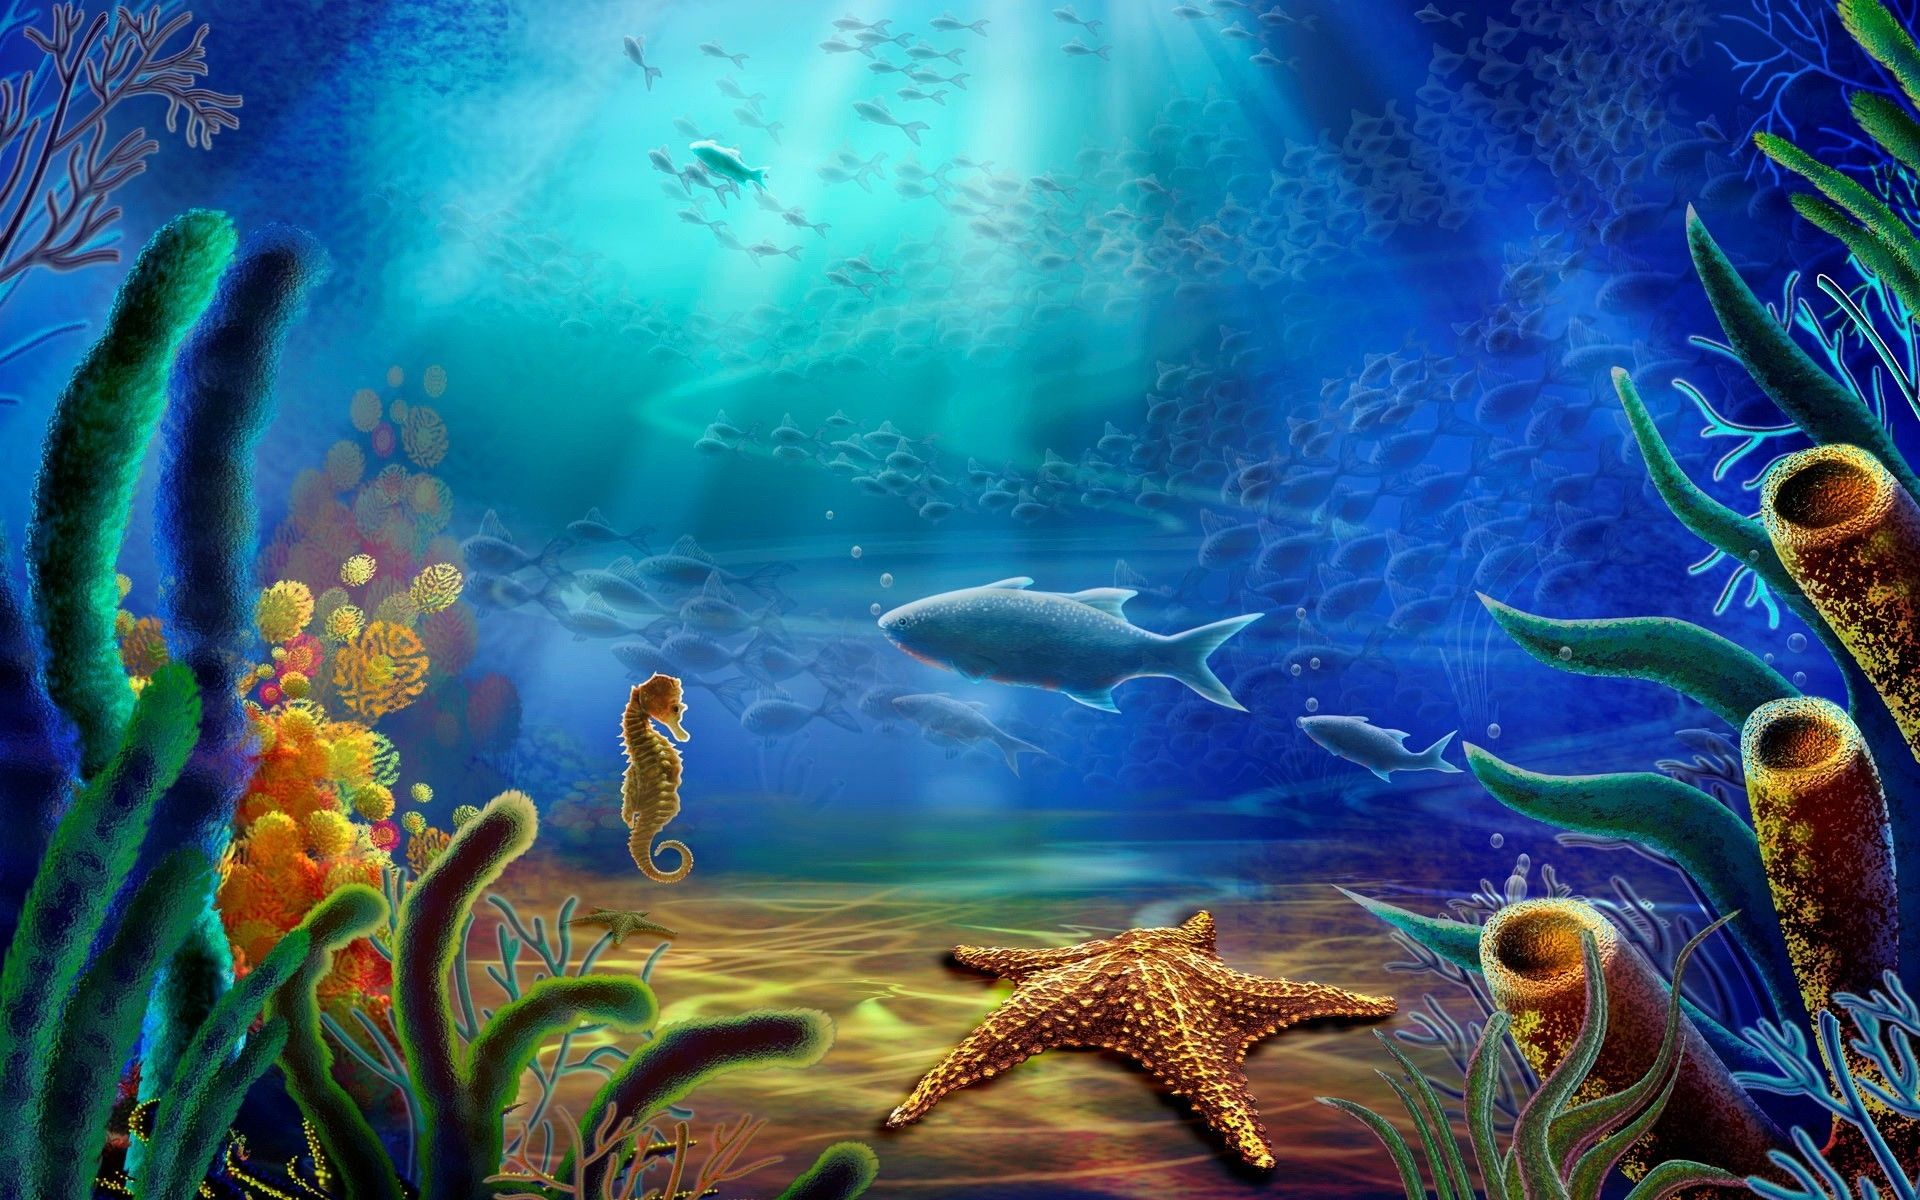 Under Water Wallpaper Underwater Wallpaper Underwater Painting Art Wallpaper